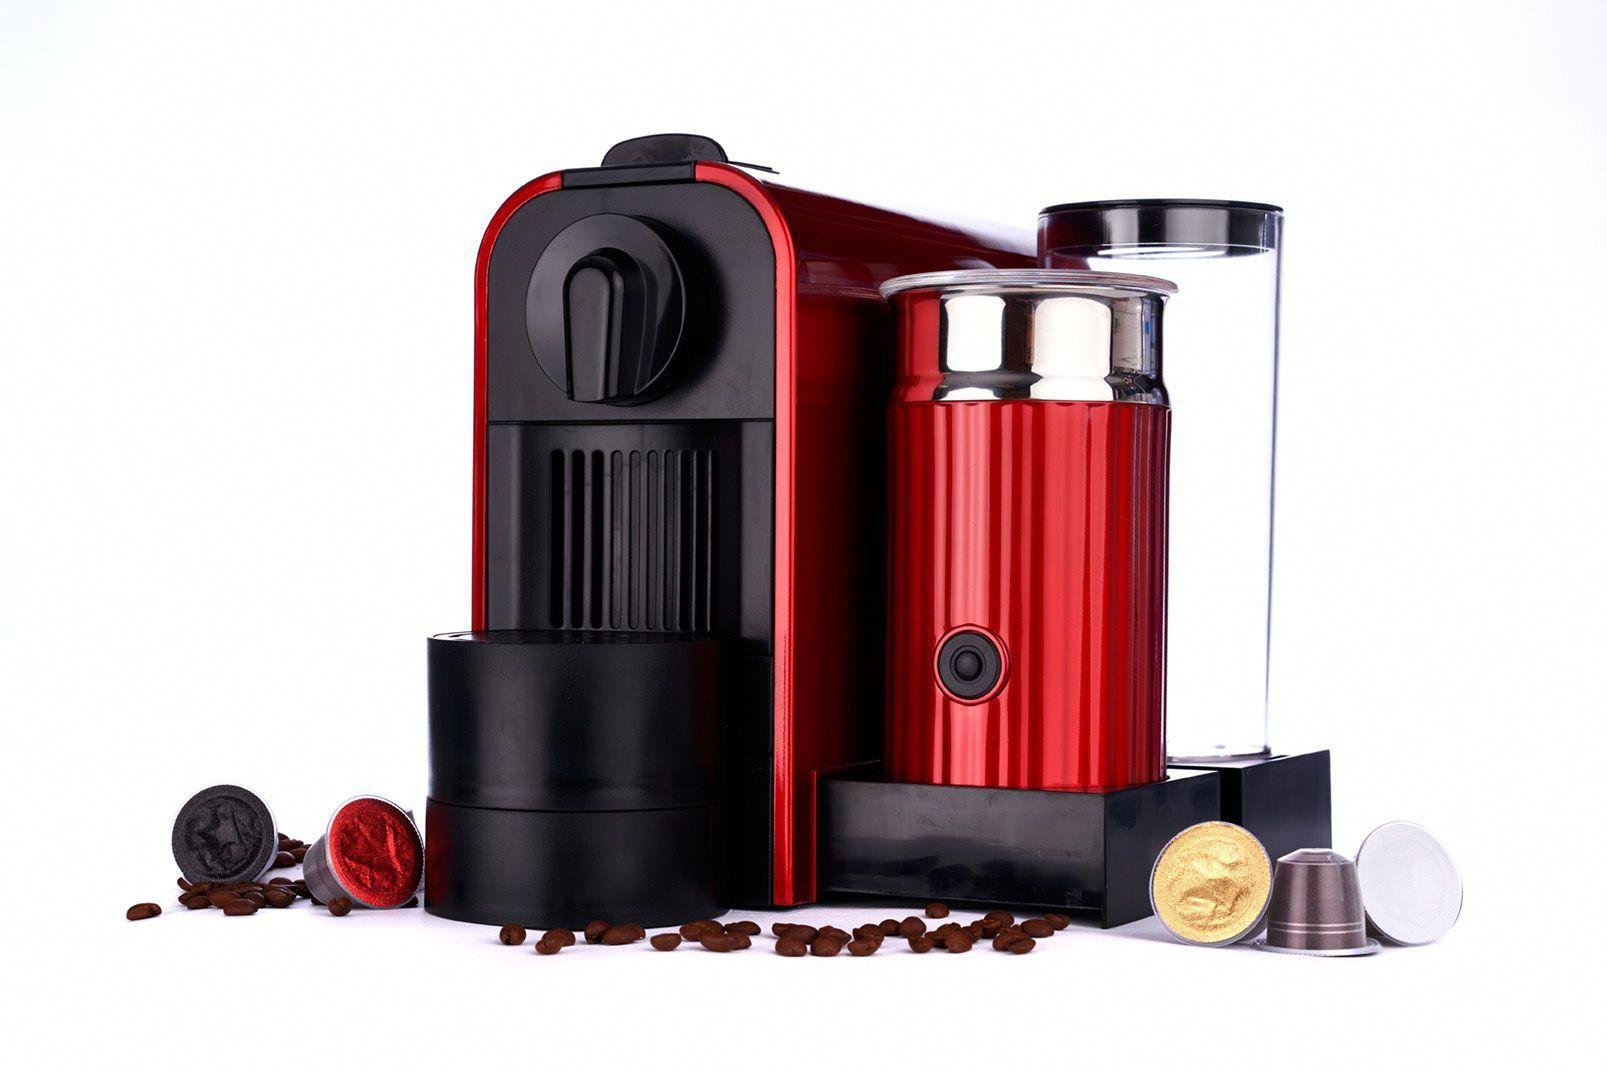 cappuccino machines cappuccinocoffee Capsule coffee